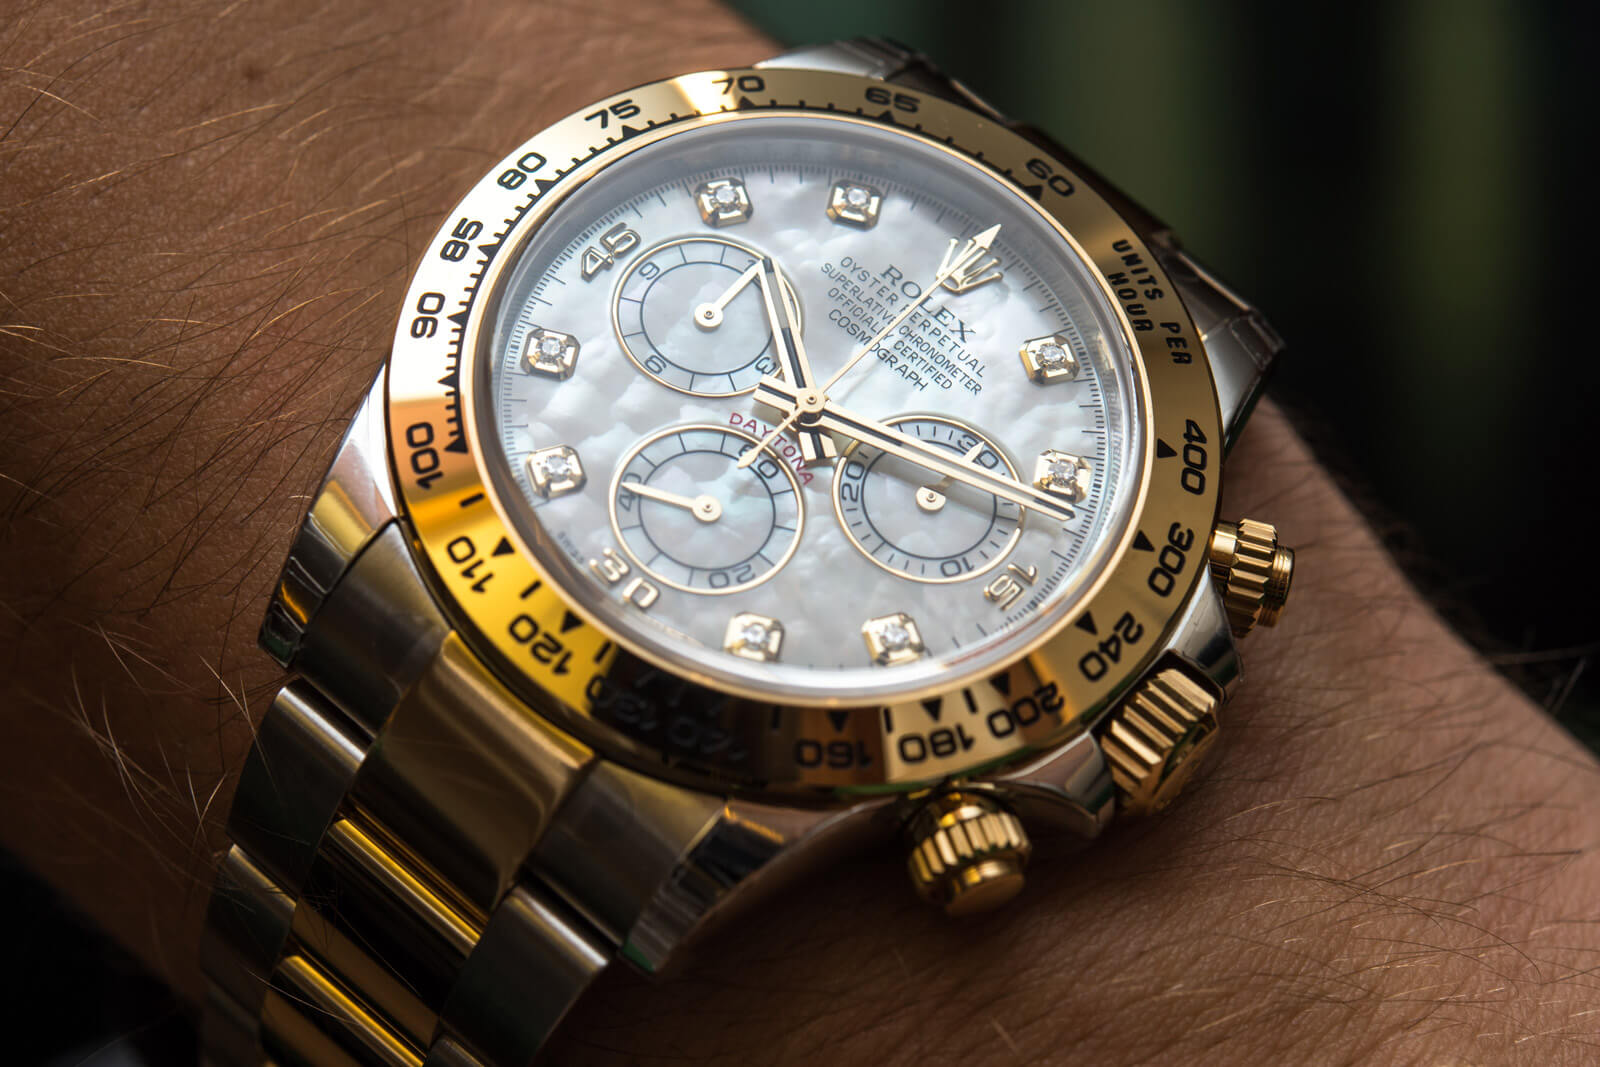 Rolex Daytona Ref. 116503 - White mother of pearl & diamonds